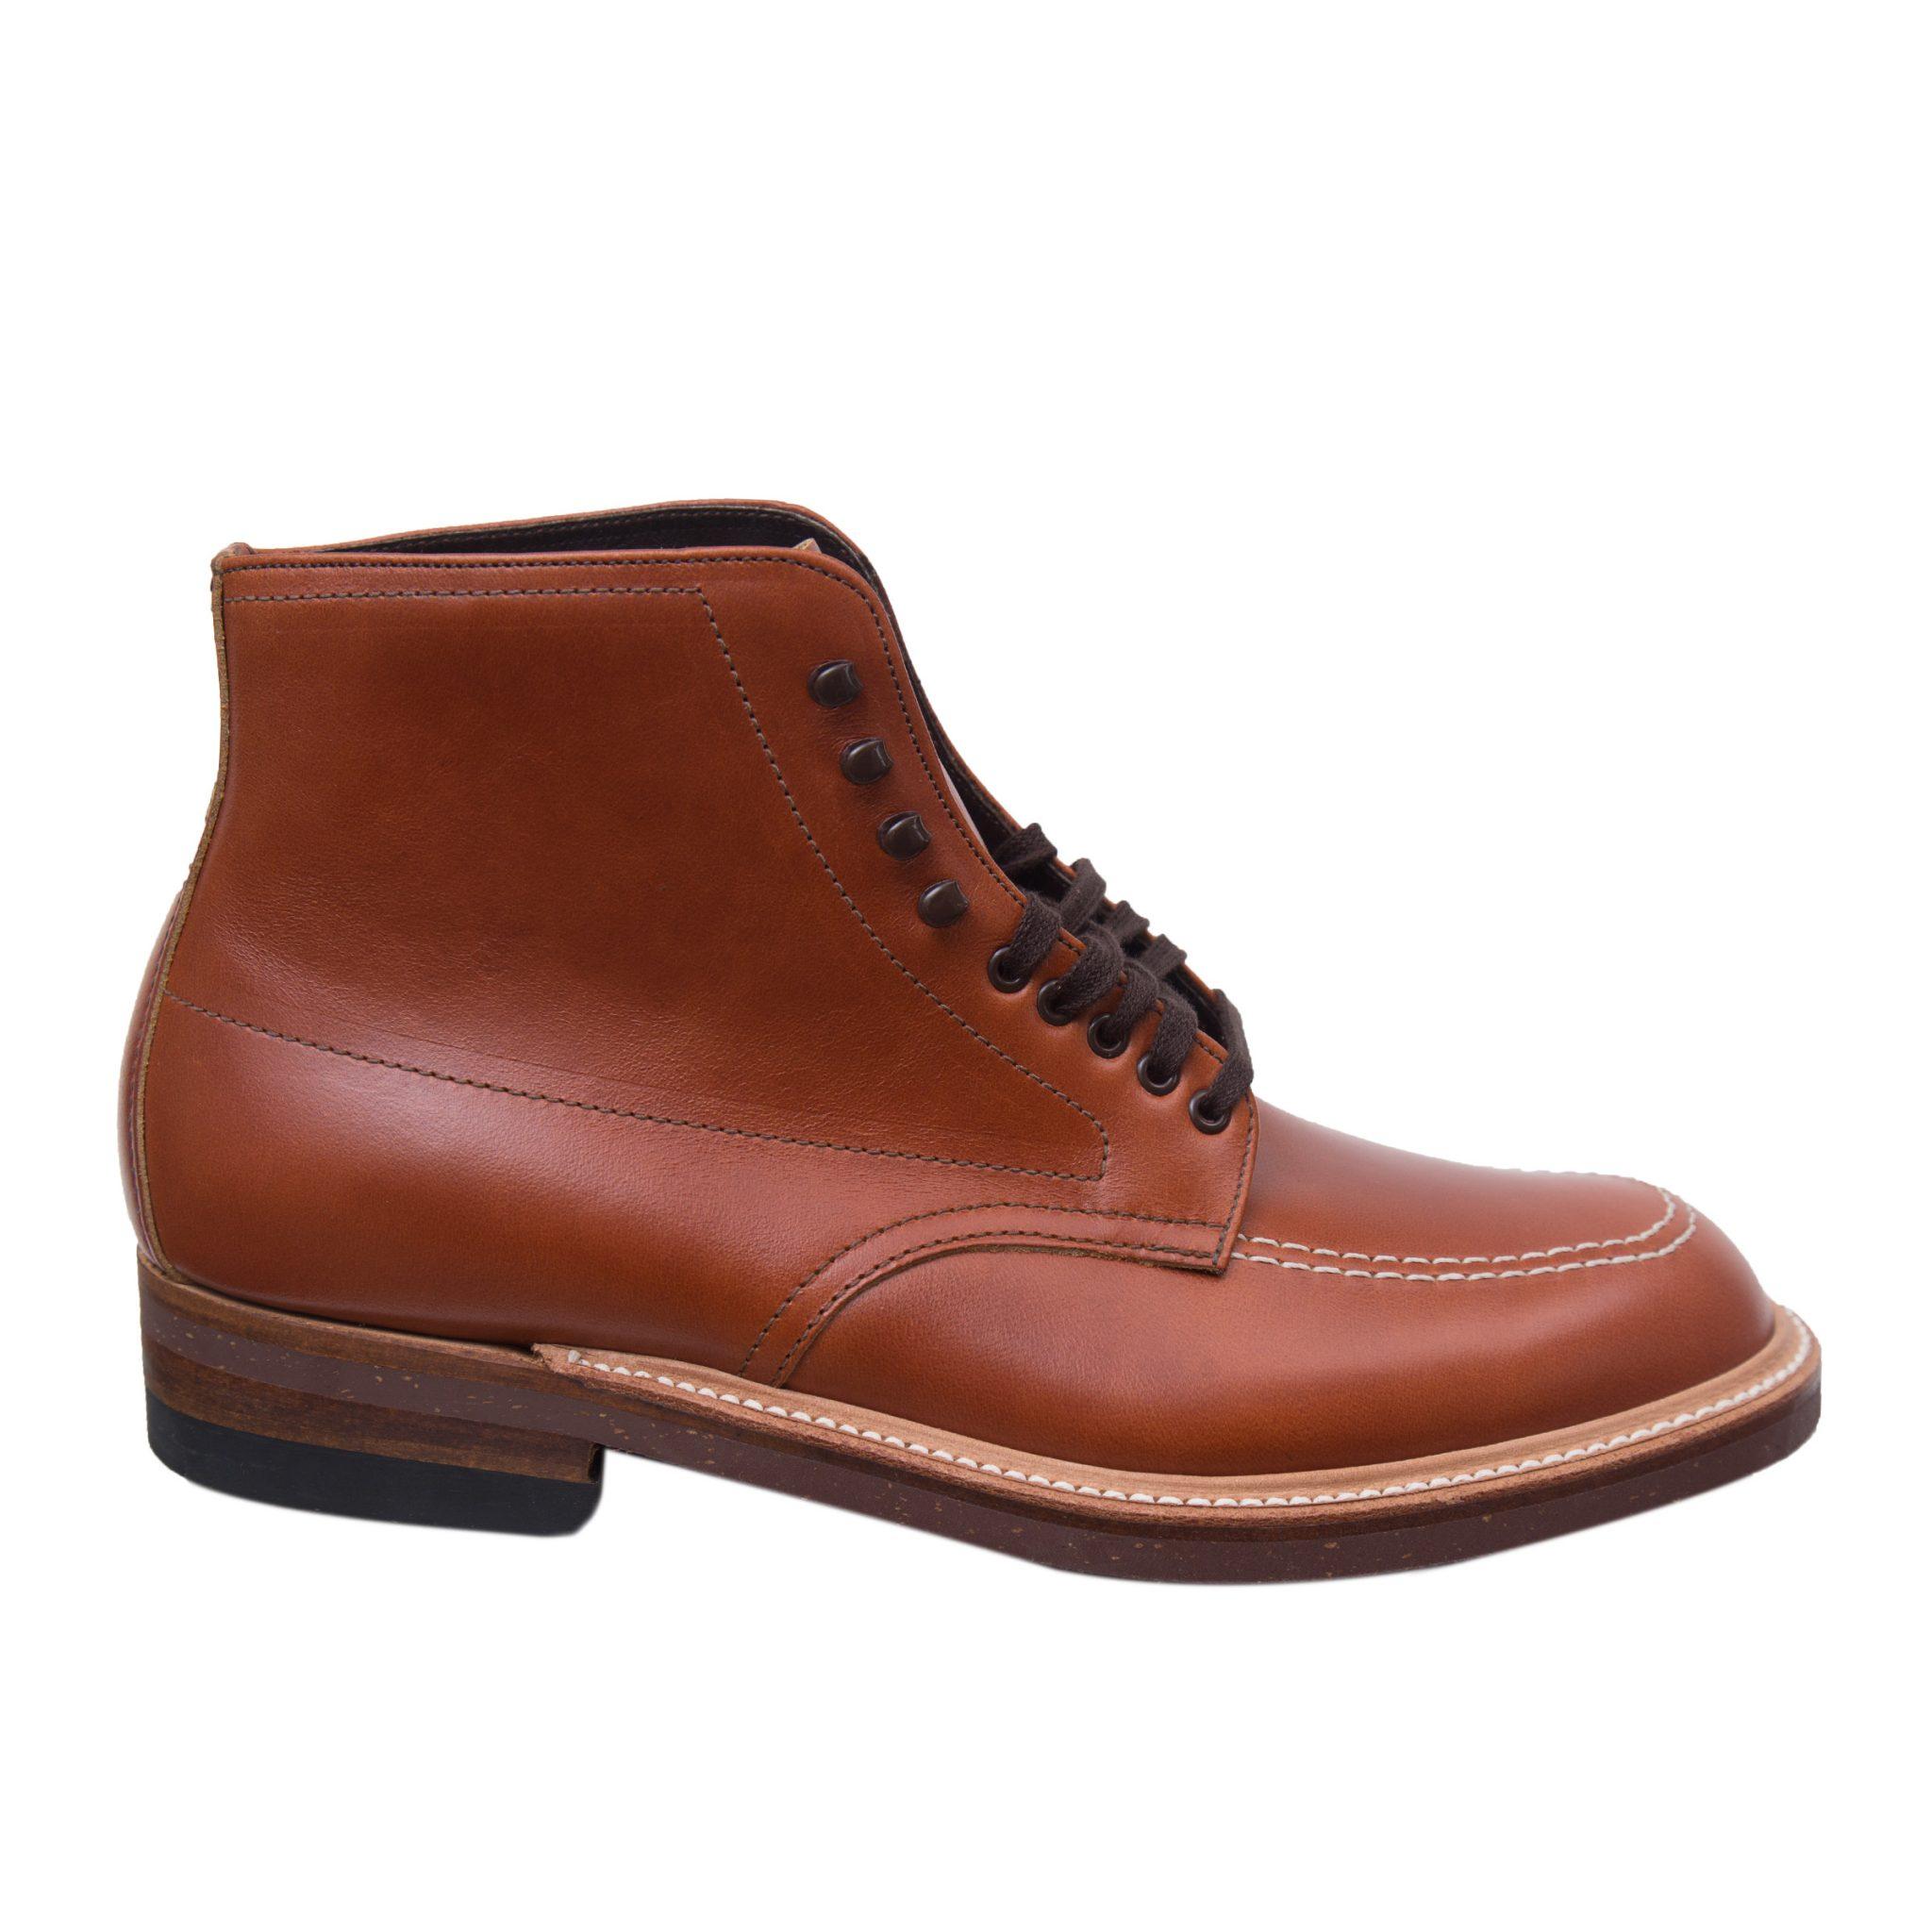 0d0e1209614 Indy Boot (Original) Brown Calf 405